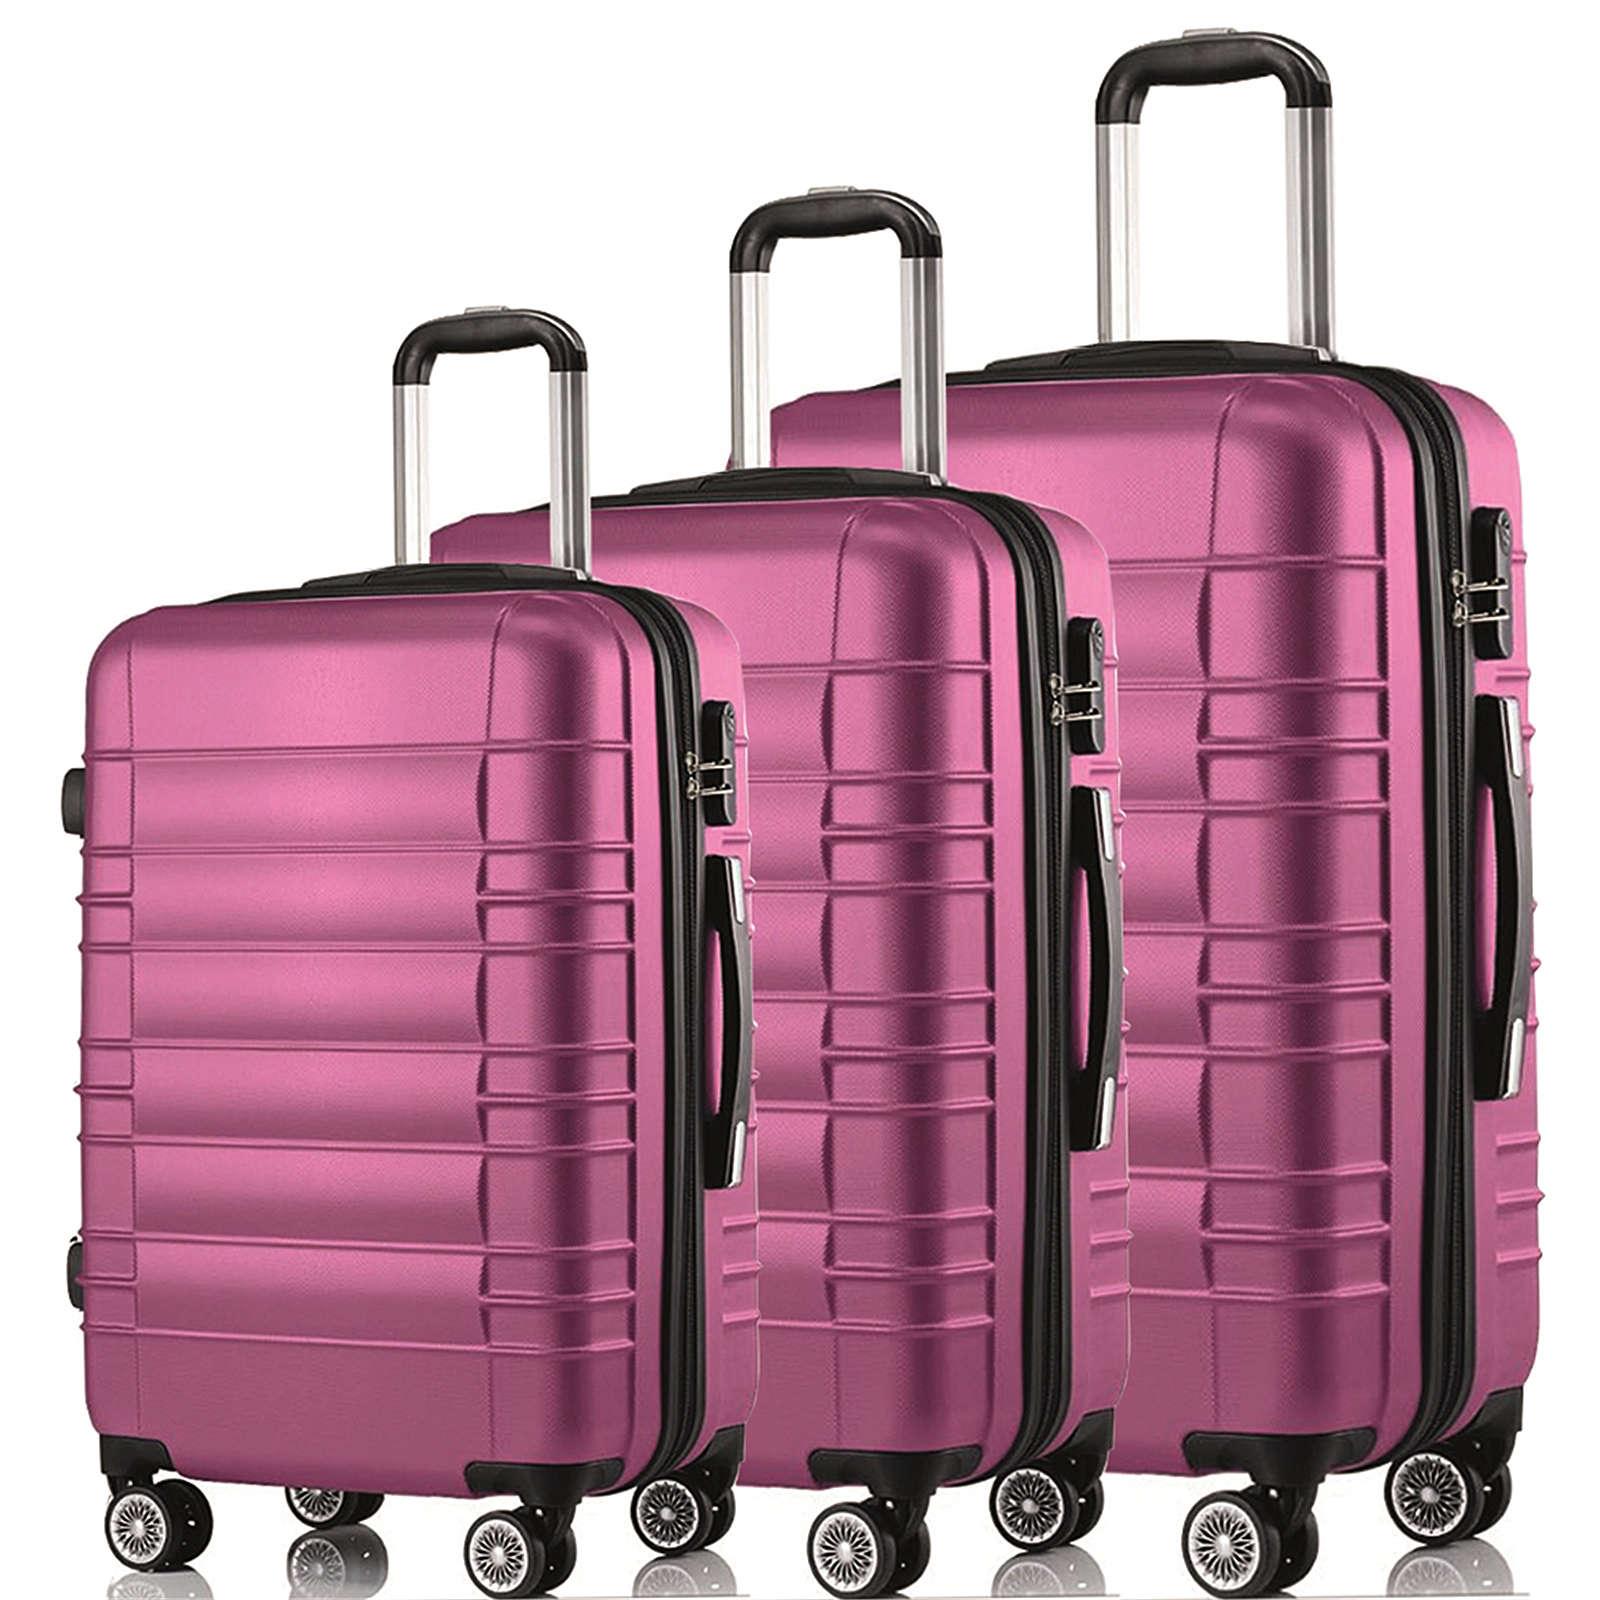 HTI-Living Kofferset 3-teilig Travelstar Koffer L: 57 x 37 x 23 cm, Koffer XL: 66 x 45 x 26 cm, Koffer XXL: 76 x 52 x 30 cm pink